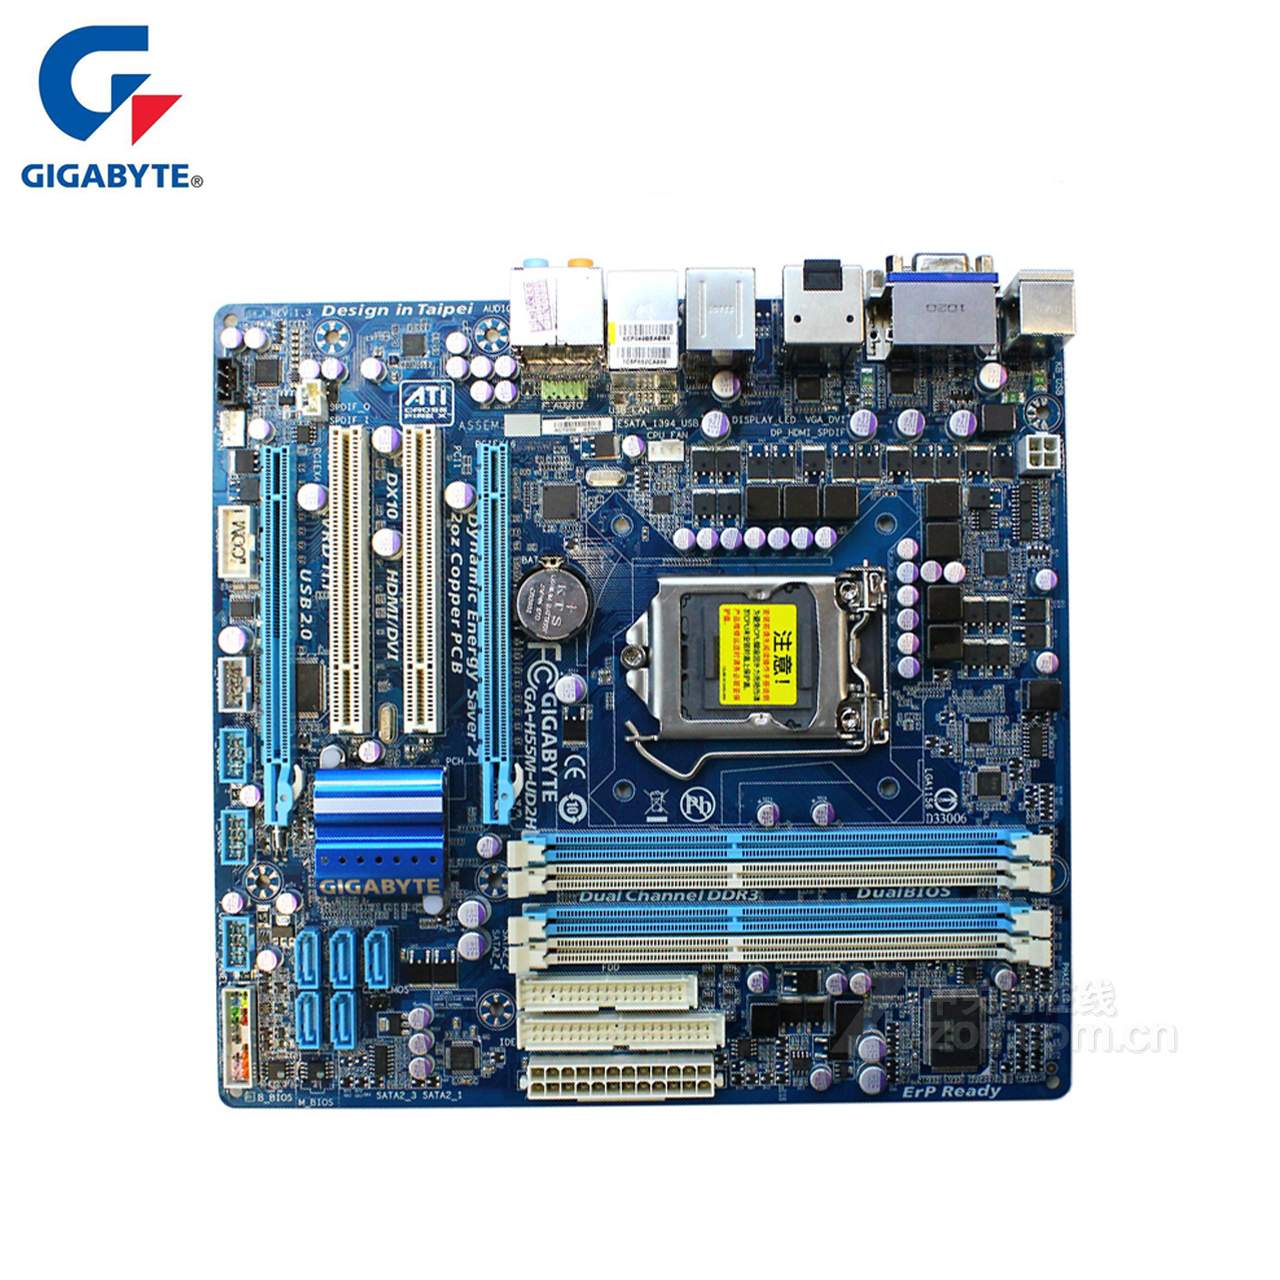 Gigabyte GA-H55M-UD2H 100% Original Motherboard LGA 1156 DDR3 16G H55 H55M-UD2H Desktop Mainboard SATA II Systemboard Used original motherboard for gigabyte ga h55m s2h lga 1156 ddr3 h55m s2h 8gb support i3 i5 i7 desktop motherboard free shipping